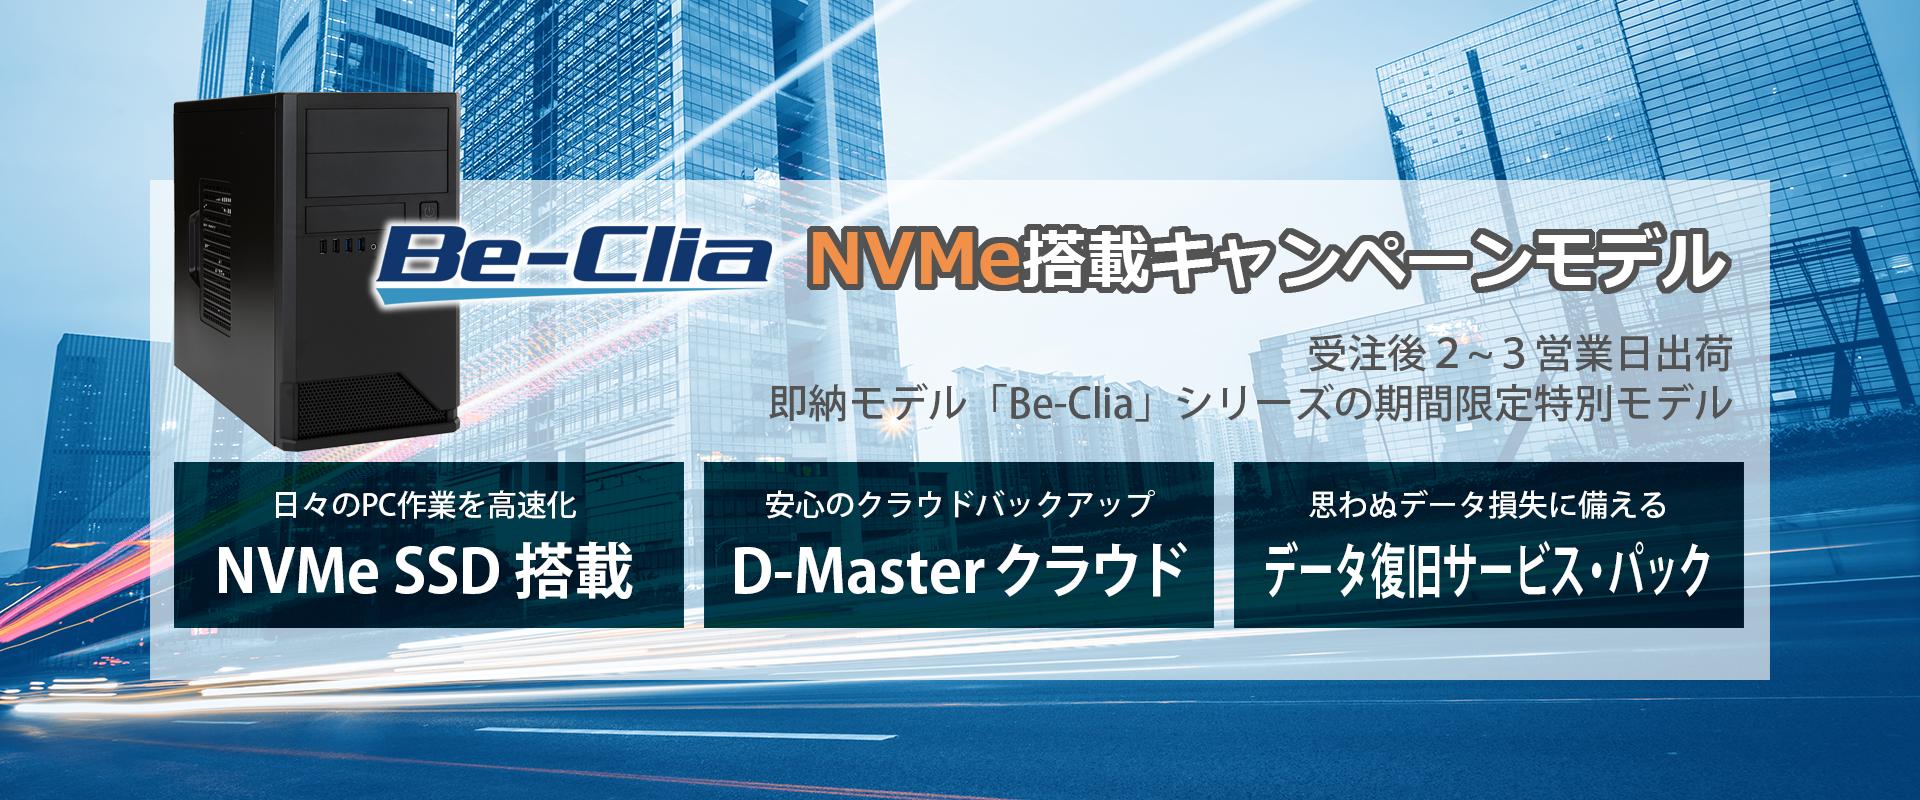 Be-Cliaシリーズ NVMe搭載キャンペーンモデル